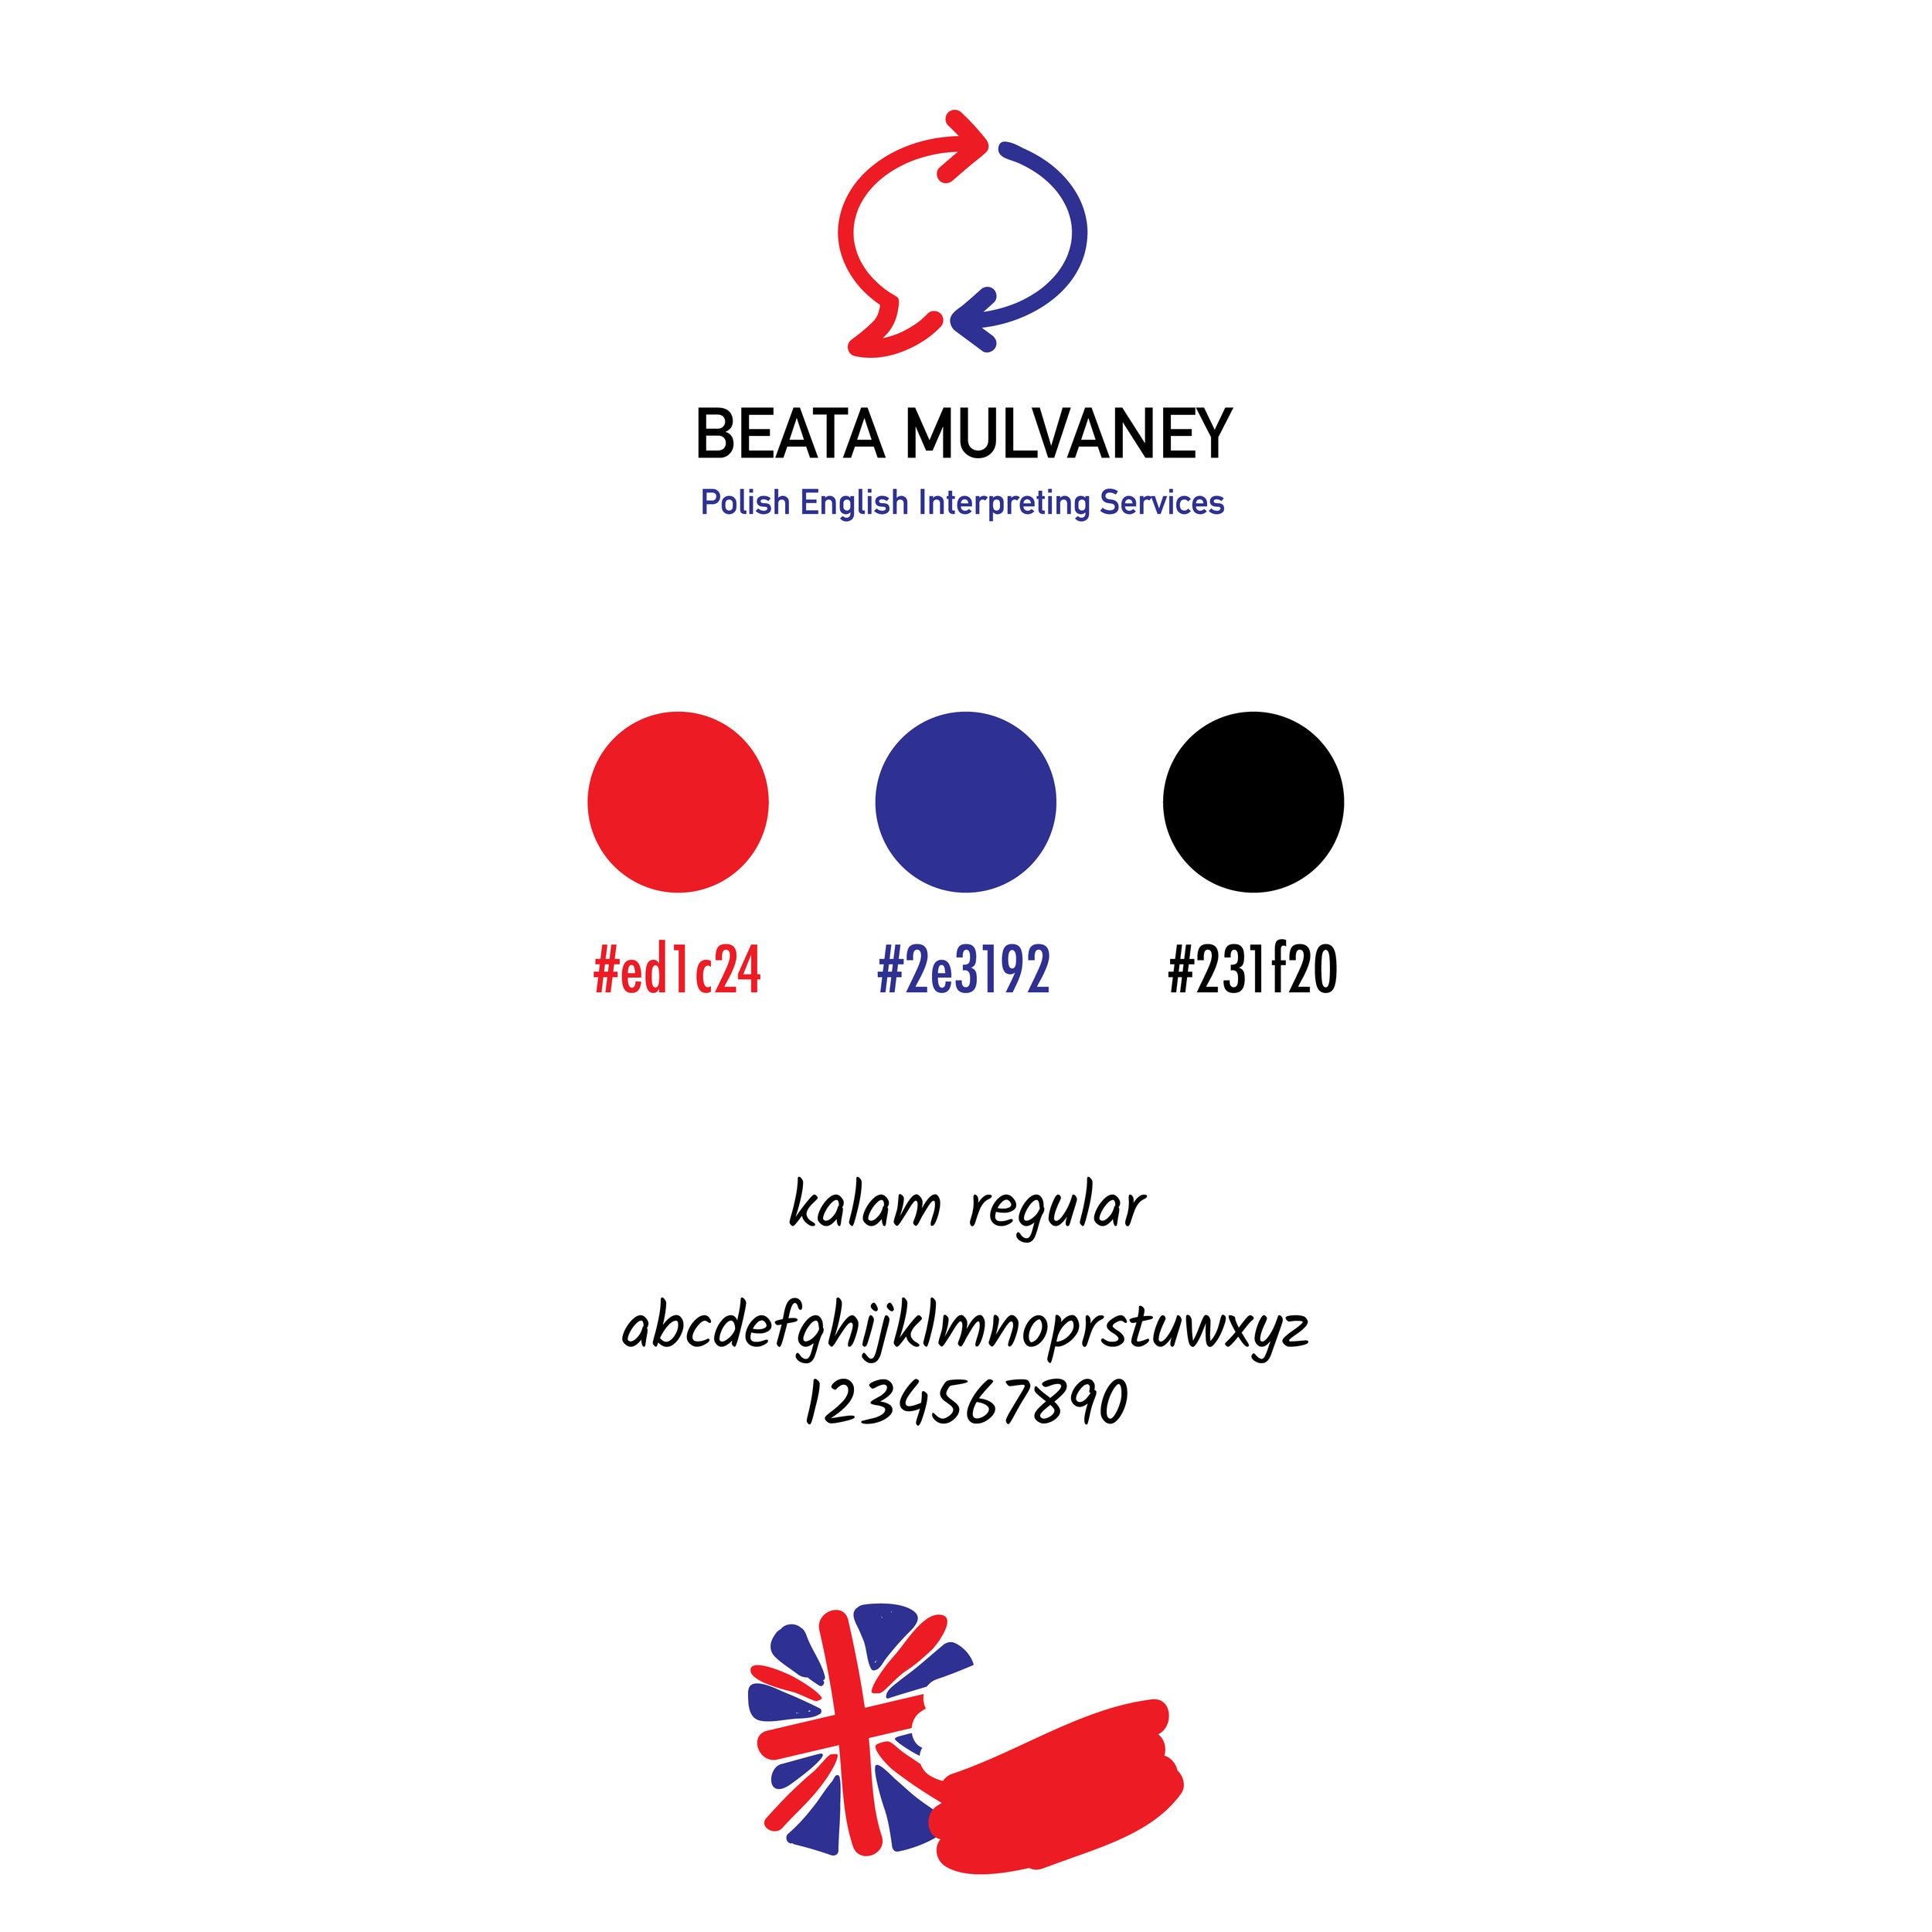 beata mulvaney logo-13.jpg